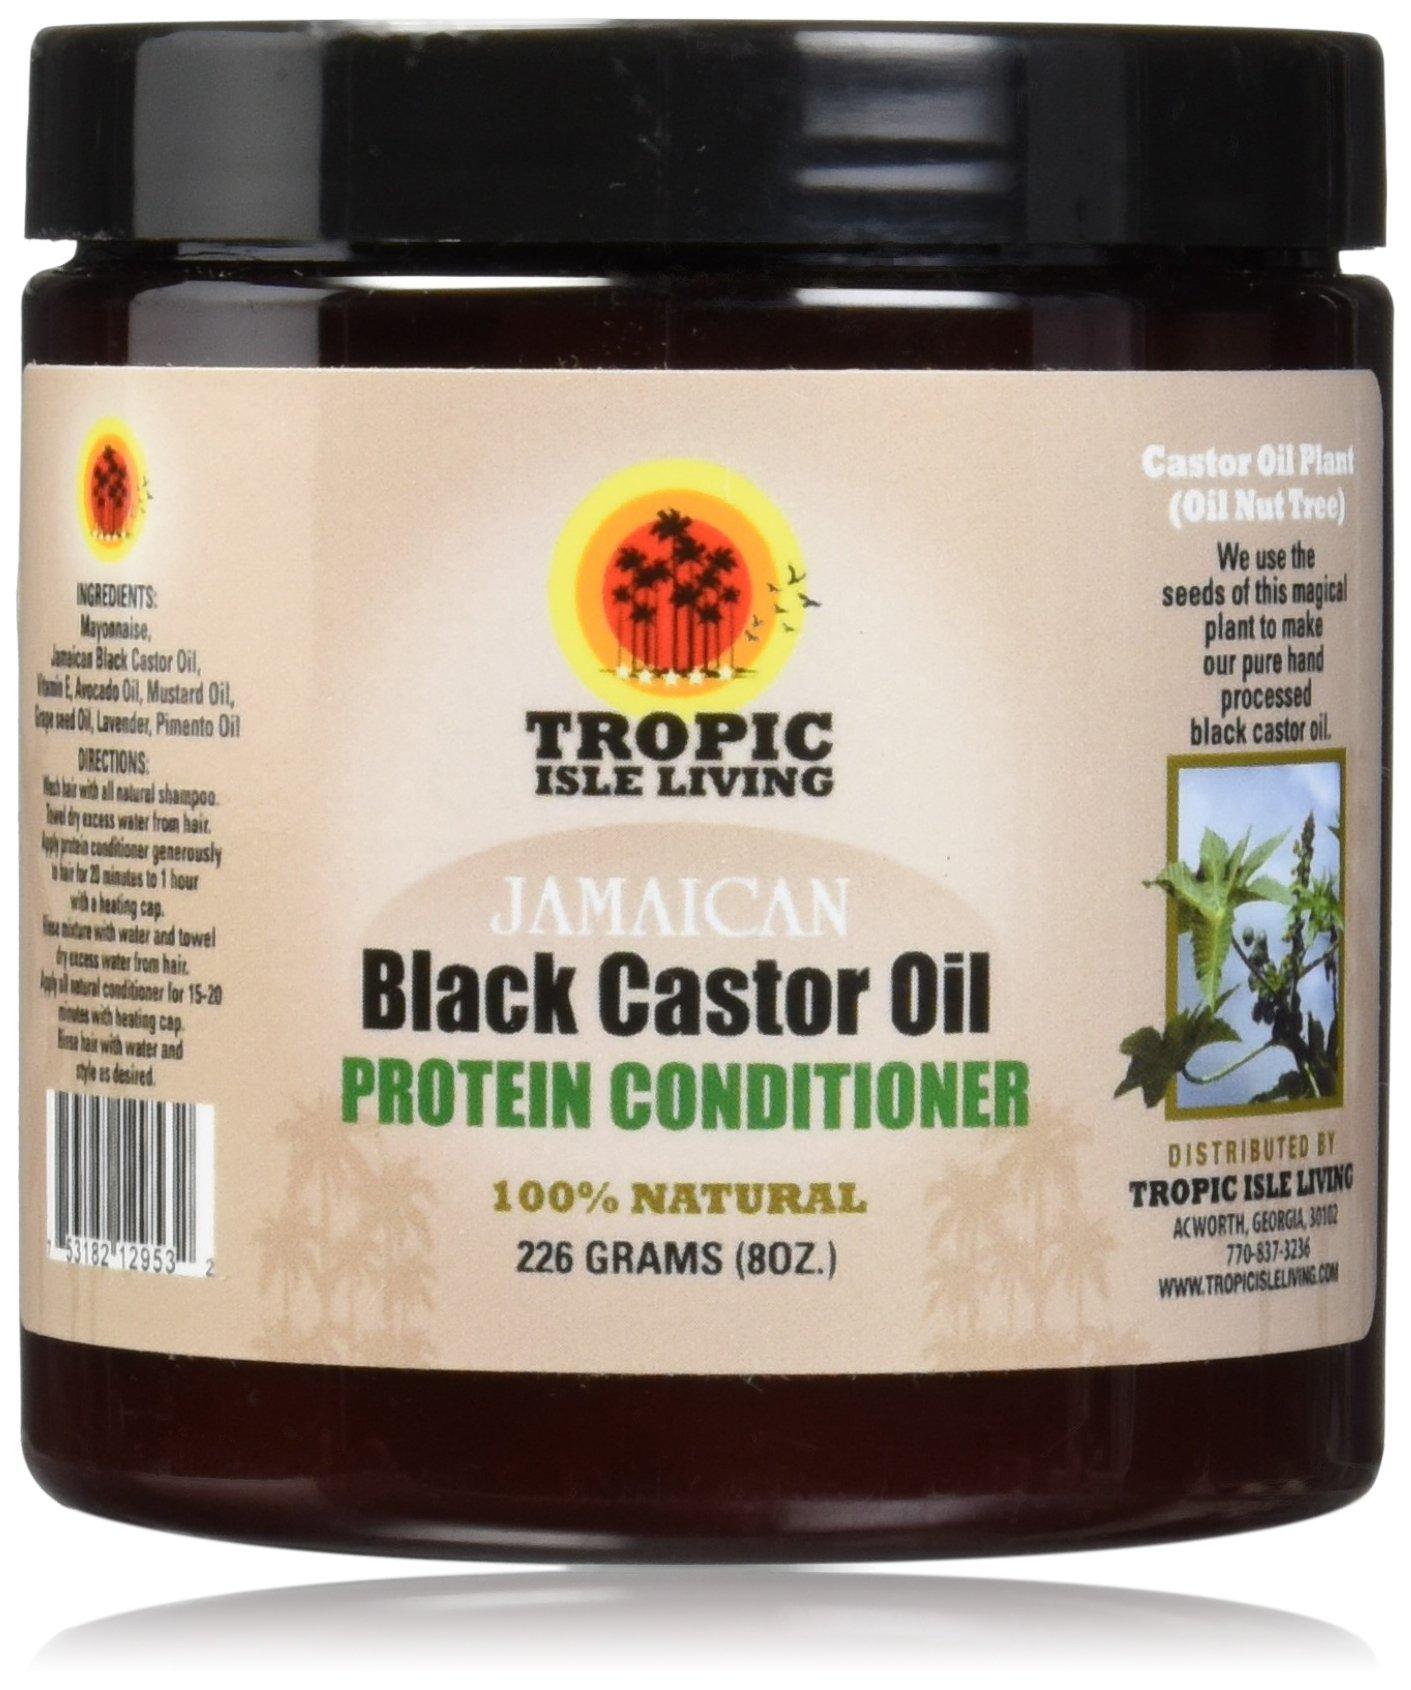 Tropic Isle Living Jamaican Black Castor Oil Protein Conditioner 8oz